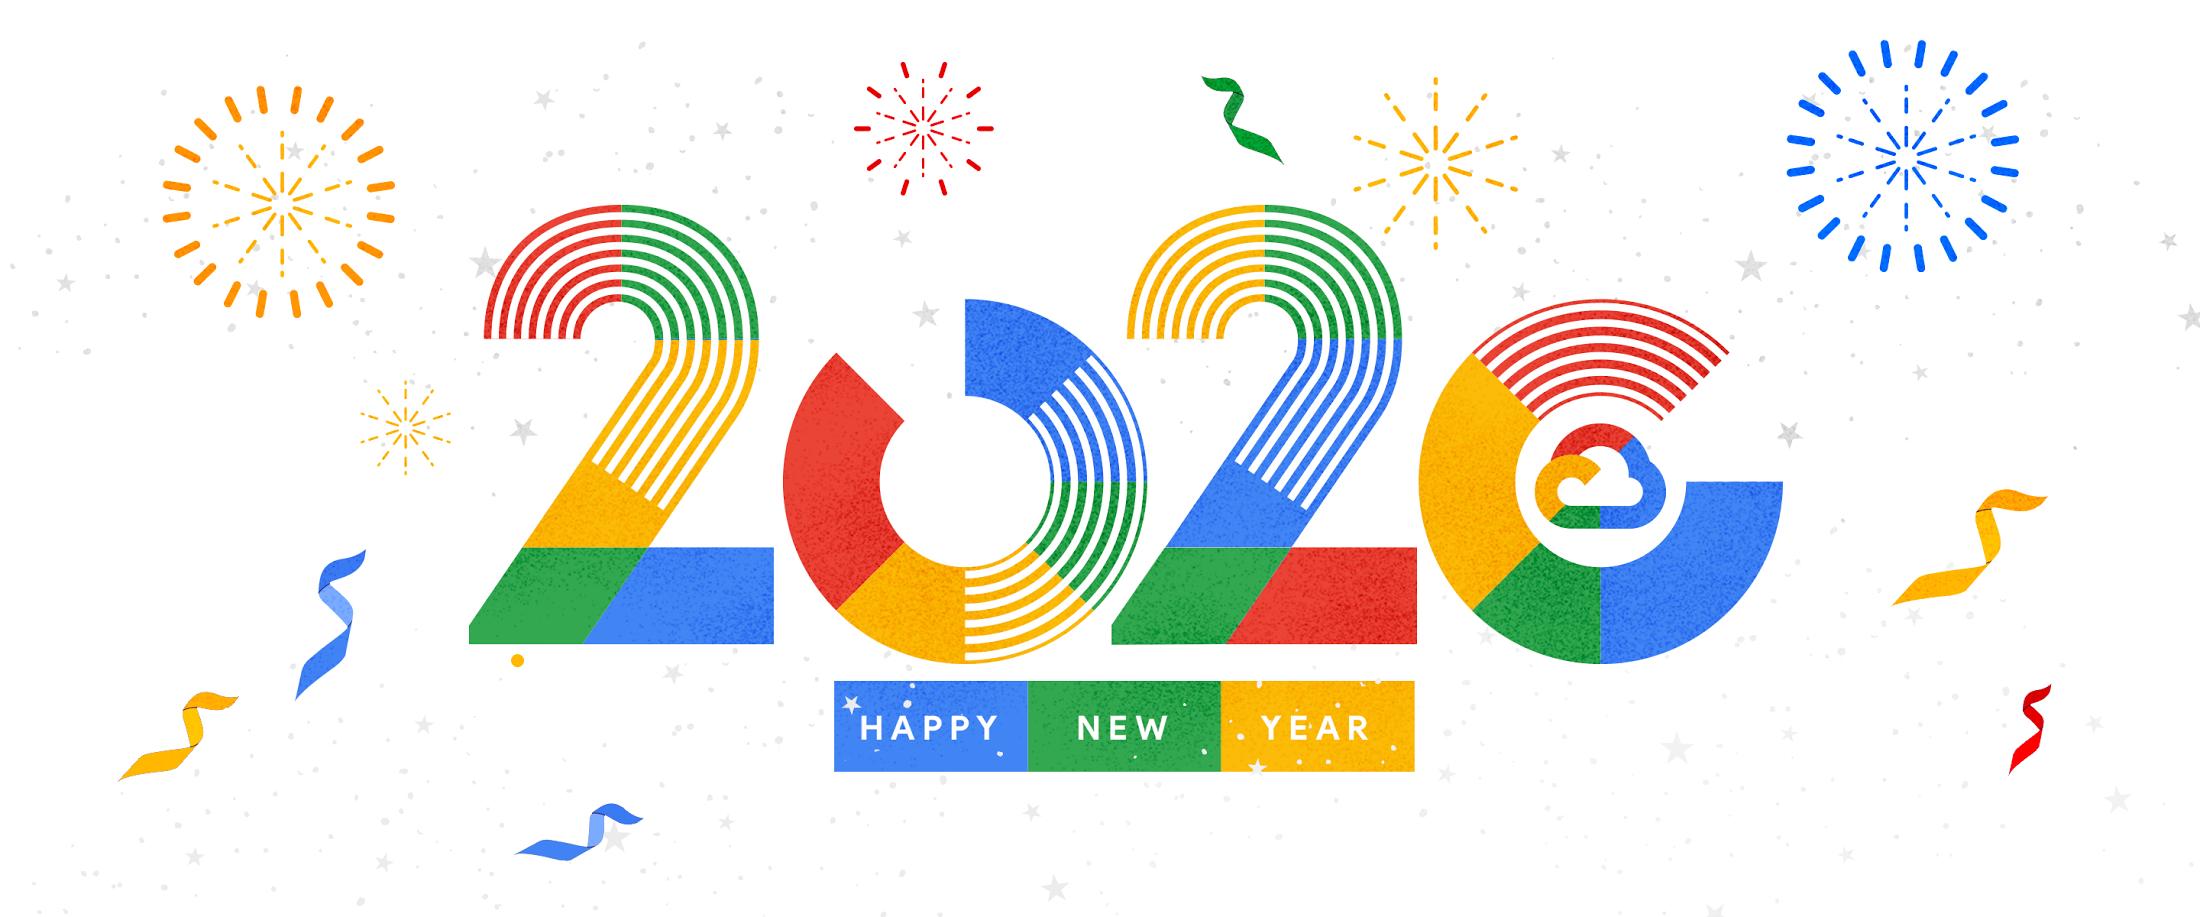 Cloud technology resolutions for 2020 | Google Cloud Blog